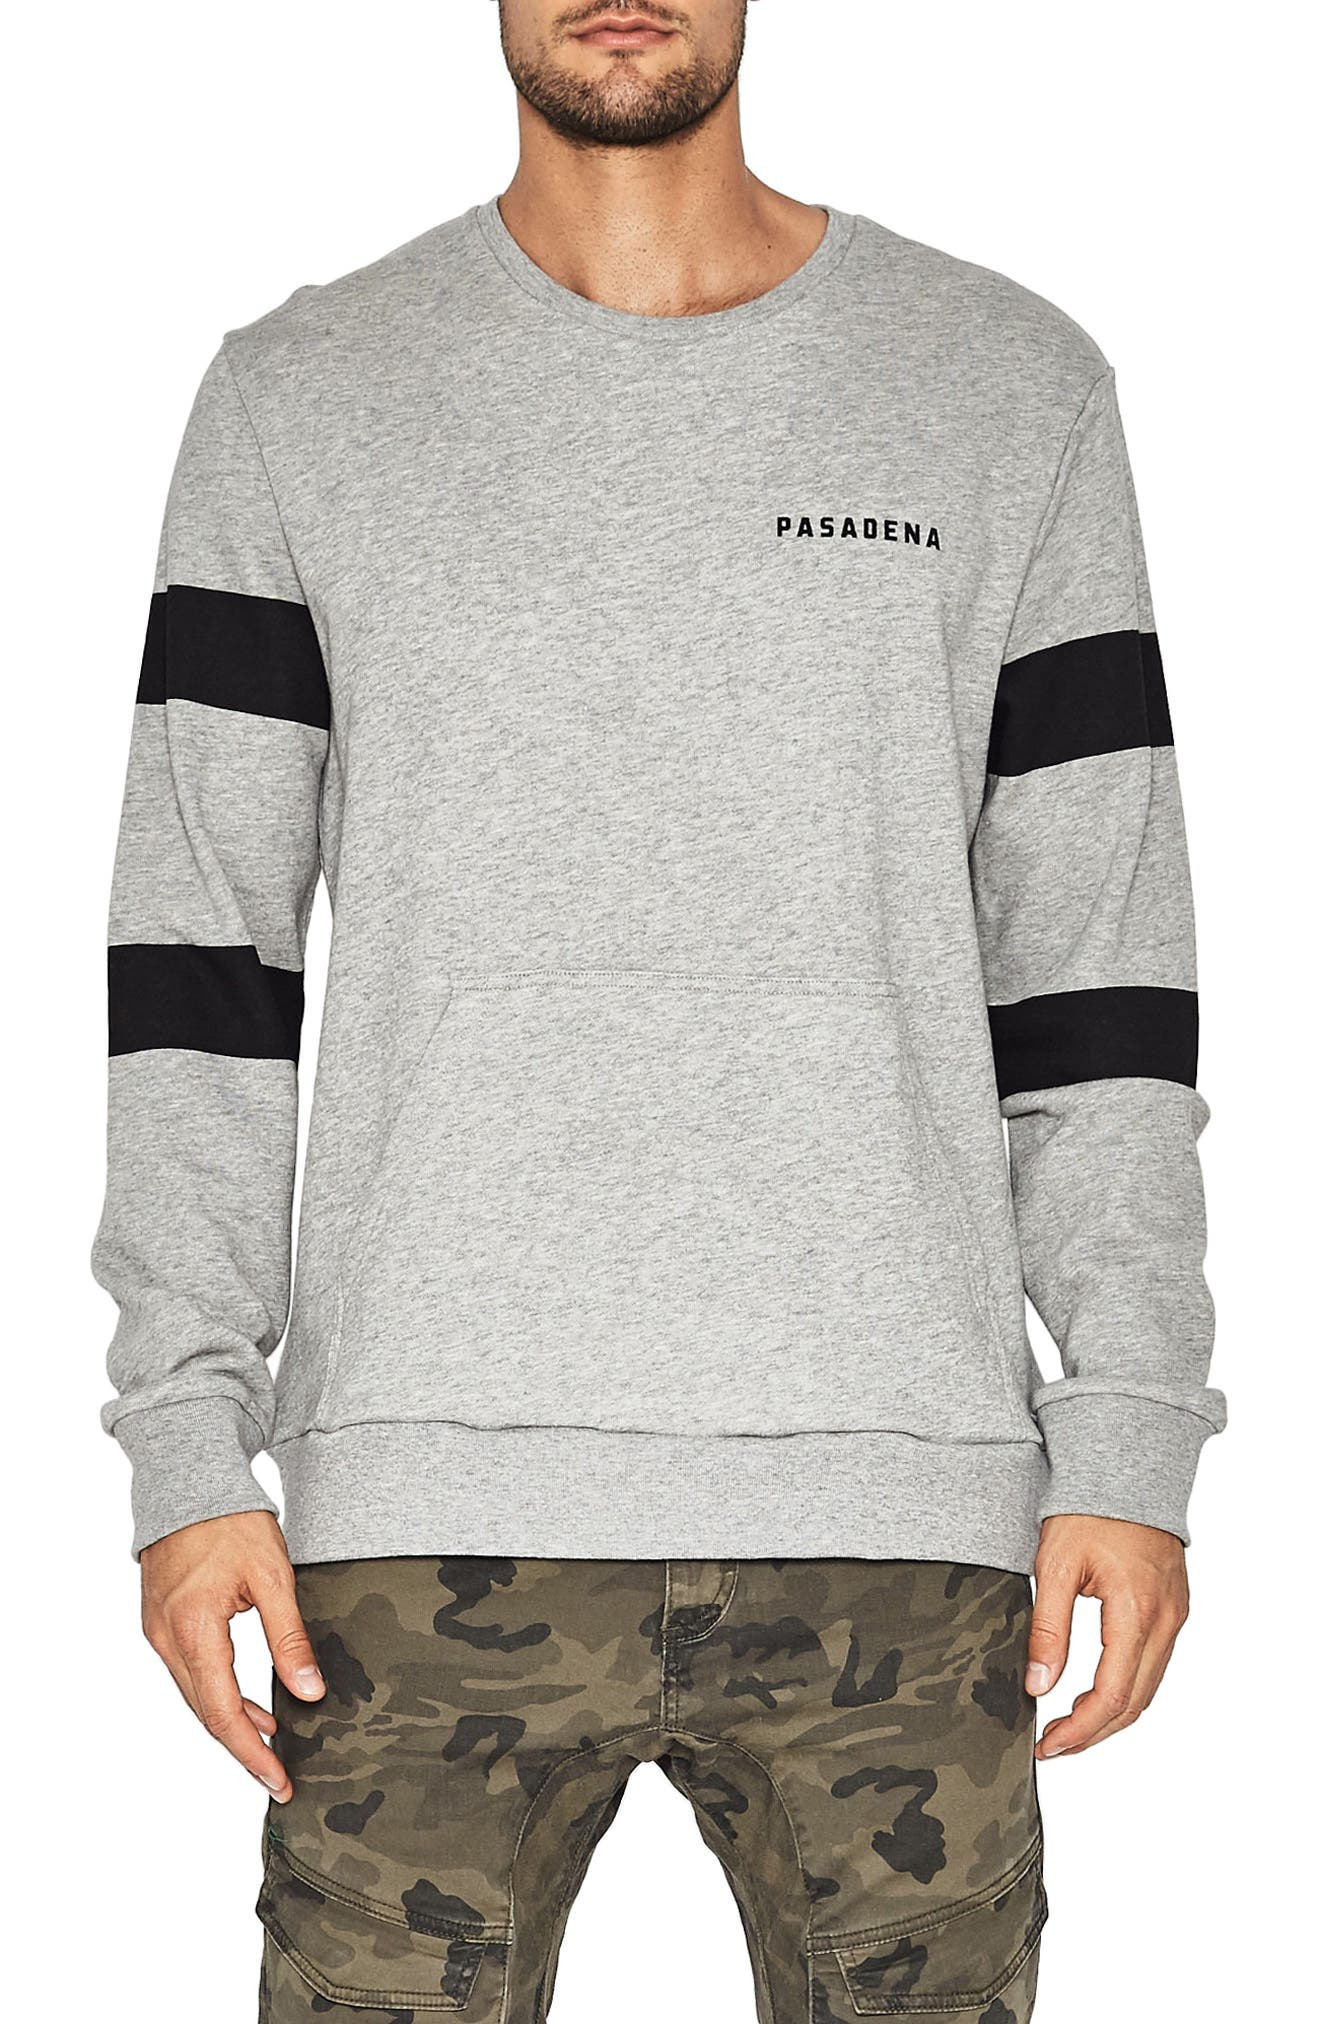 Turbo Hawk Sweatshirt,                         Main,                         color, Grey Marle